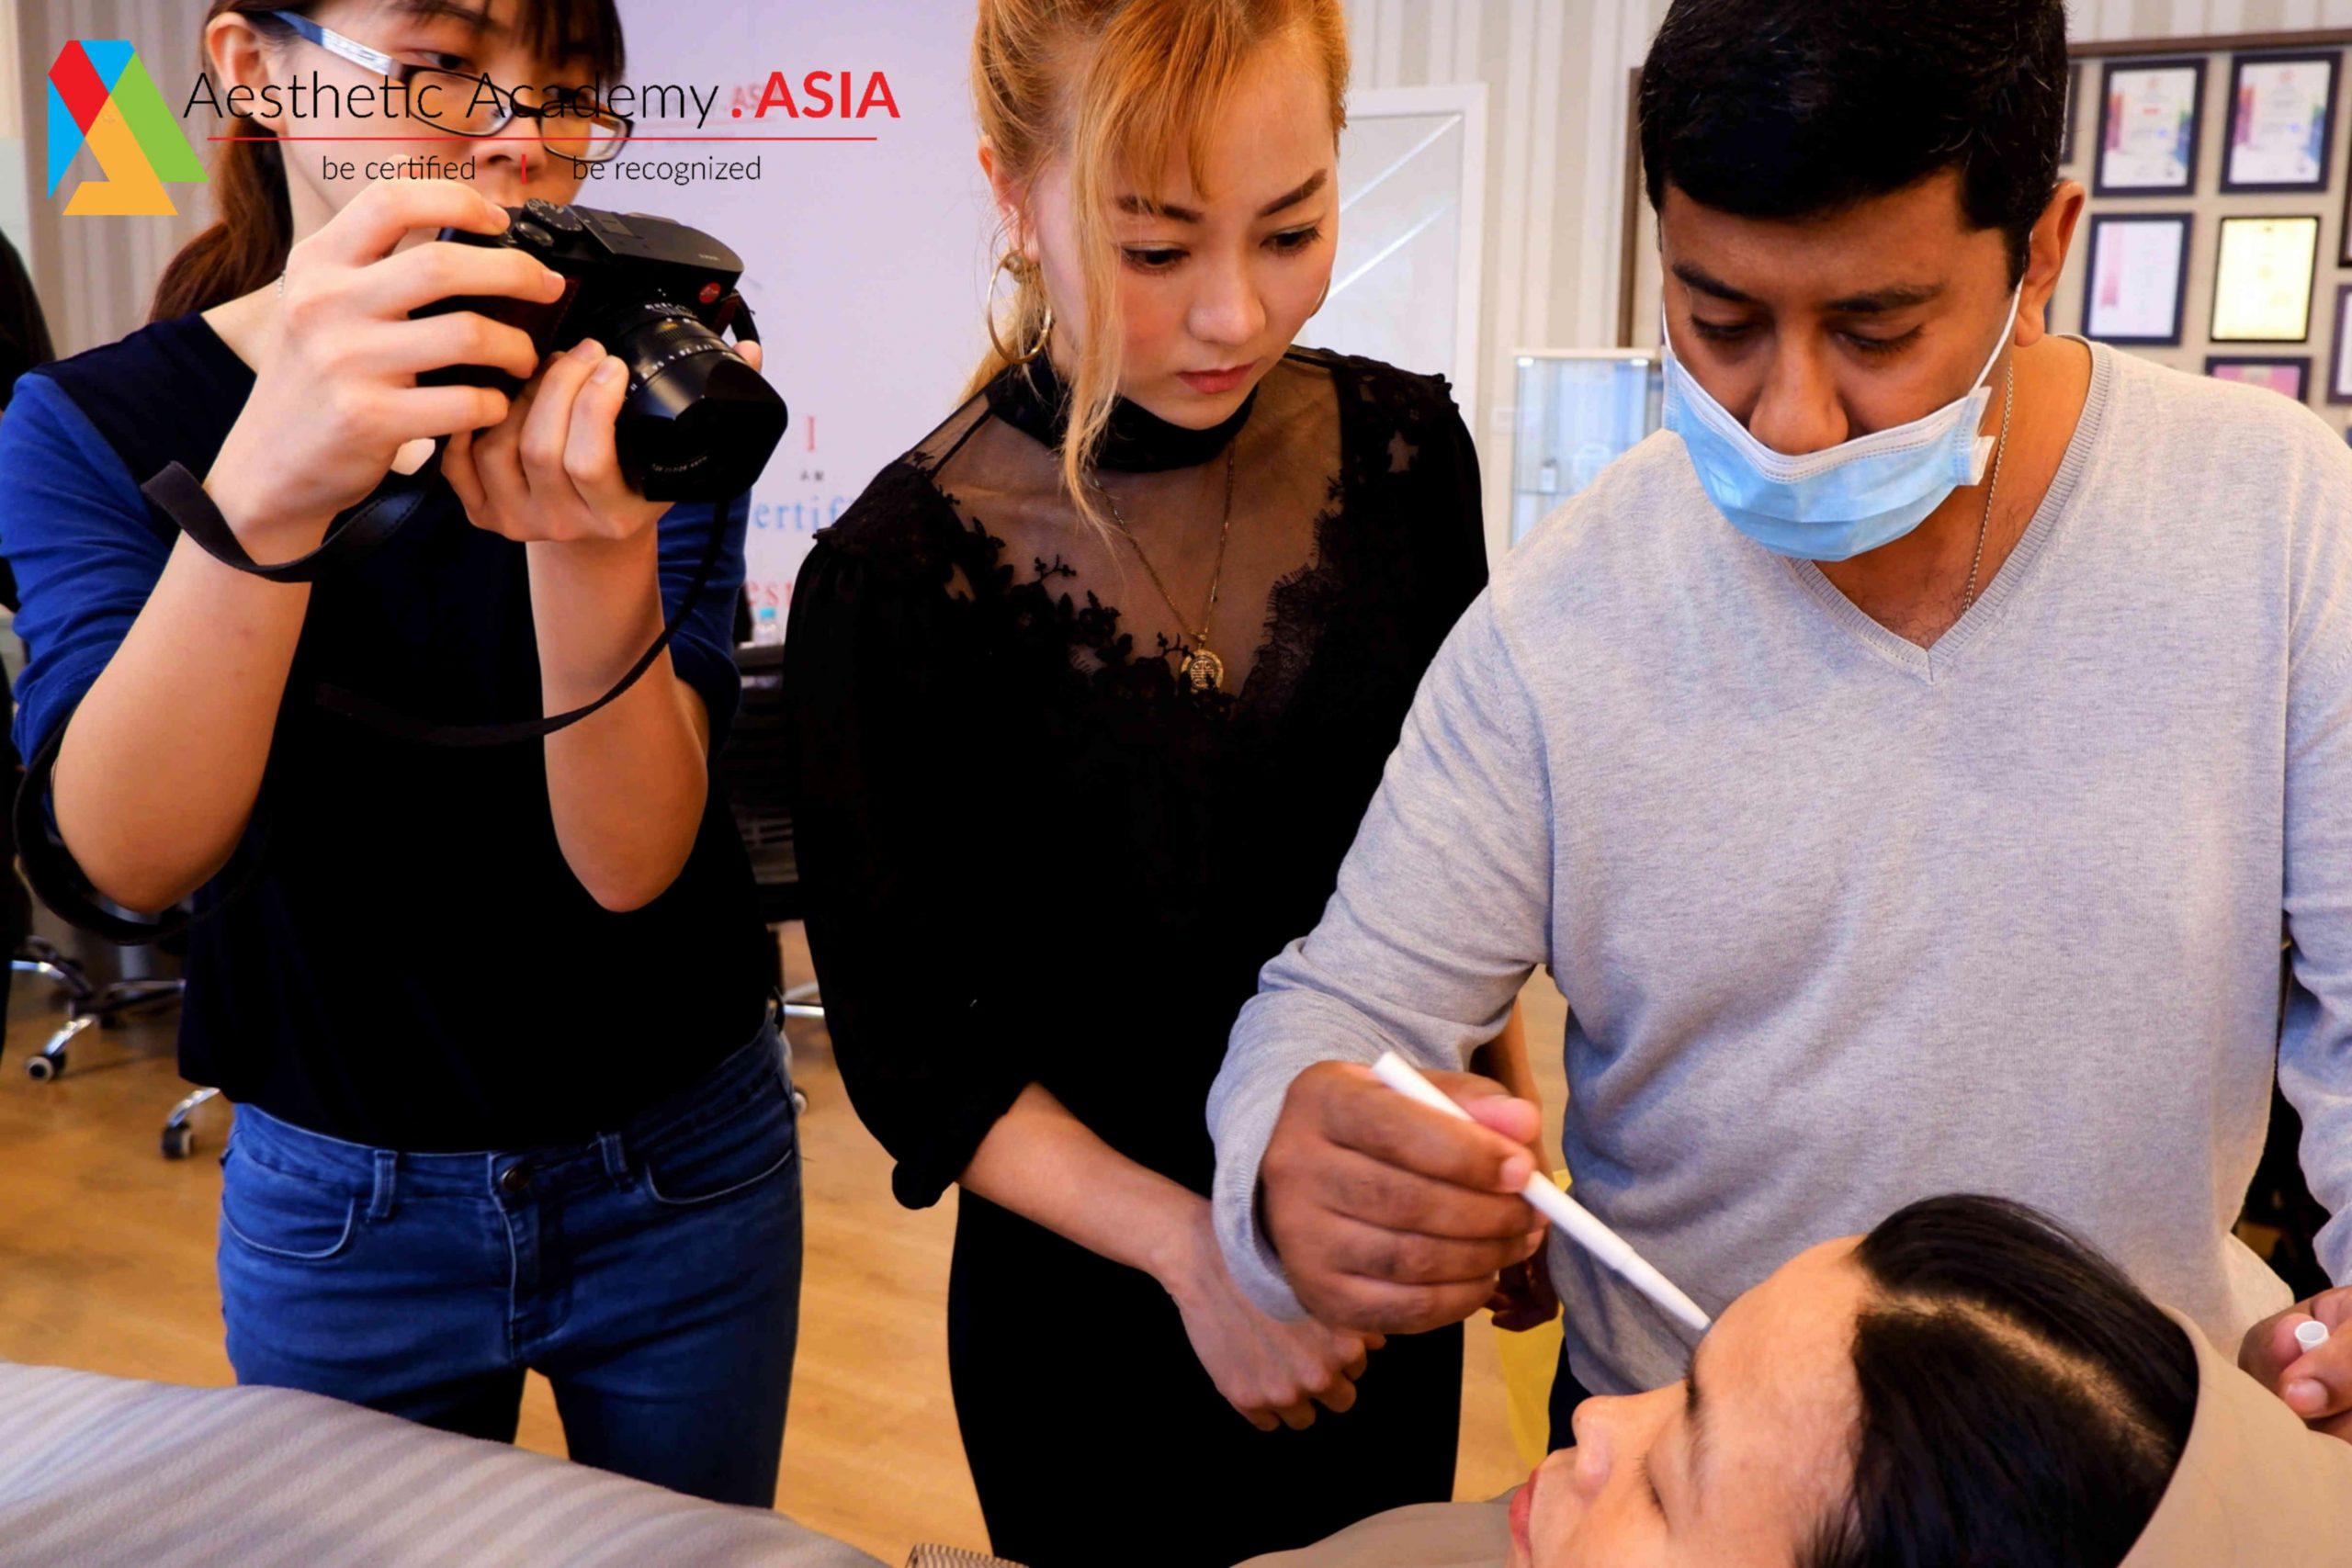 Aesthetic Training Group